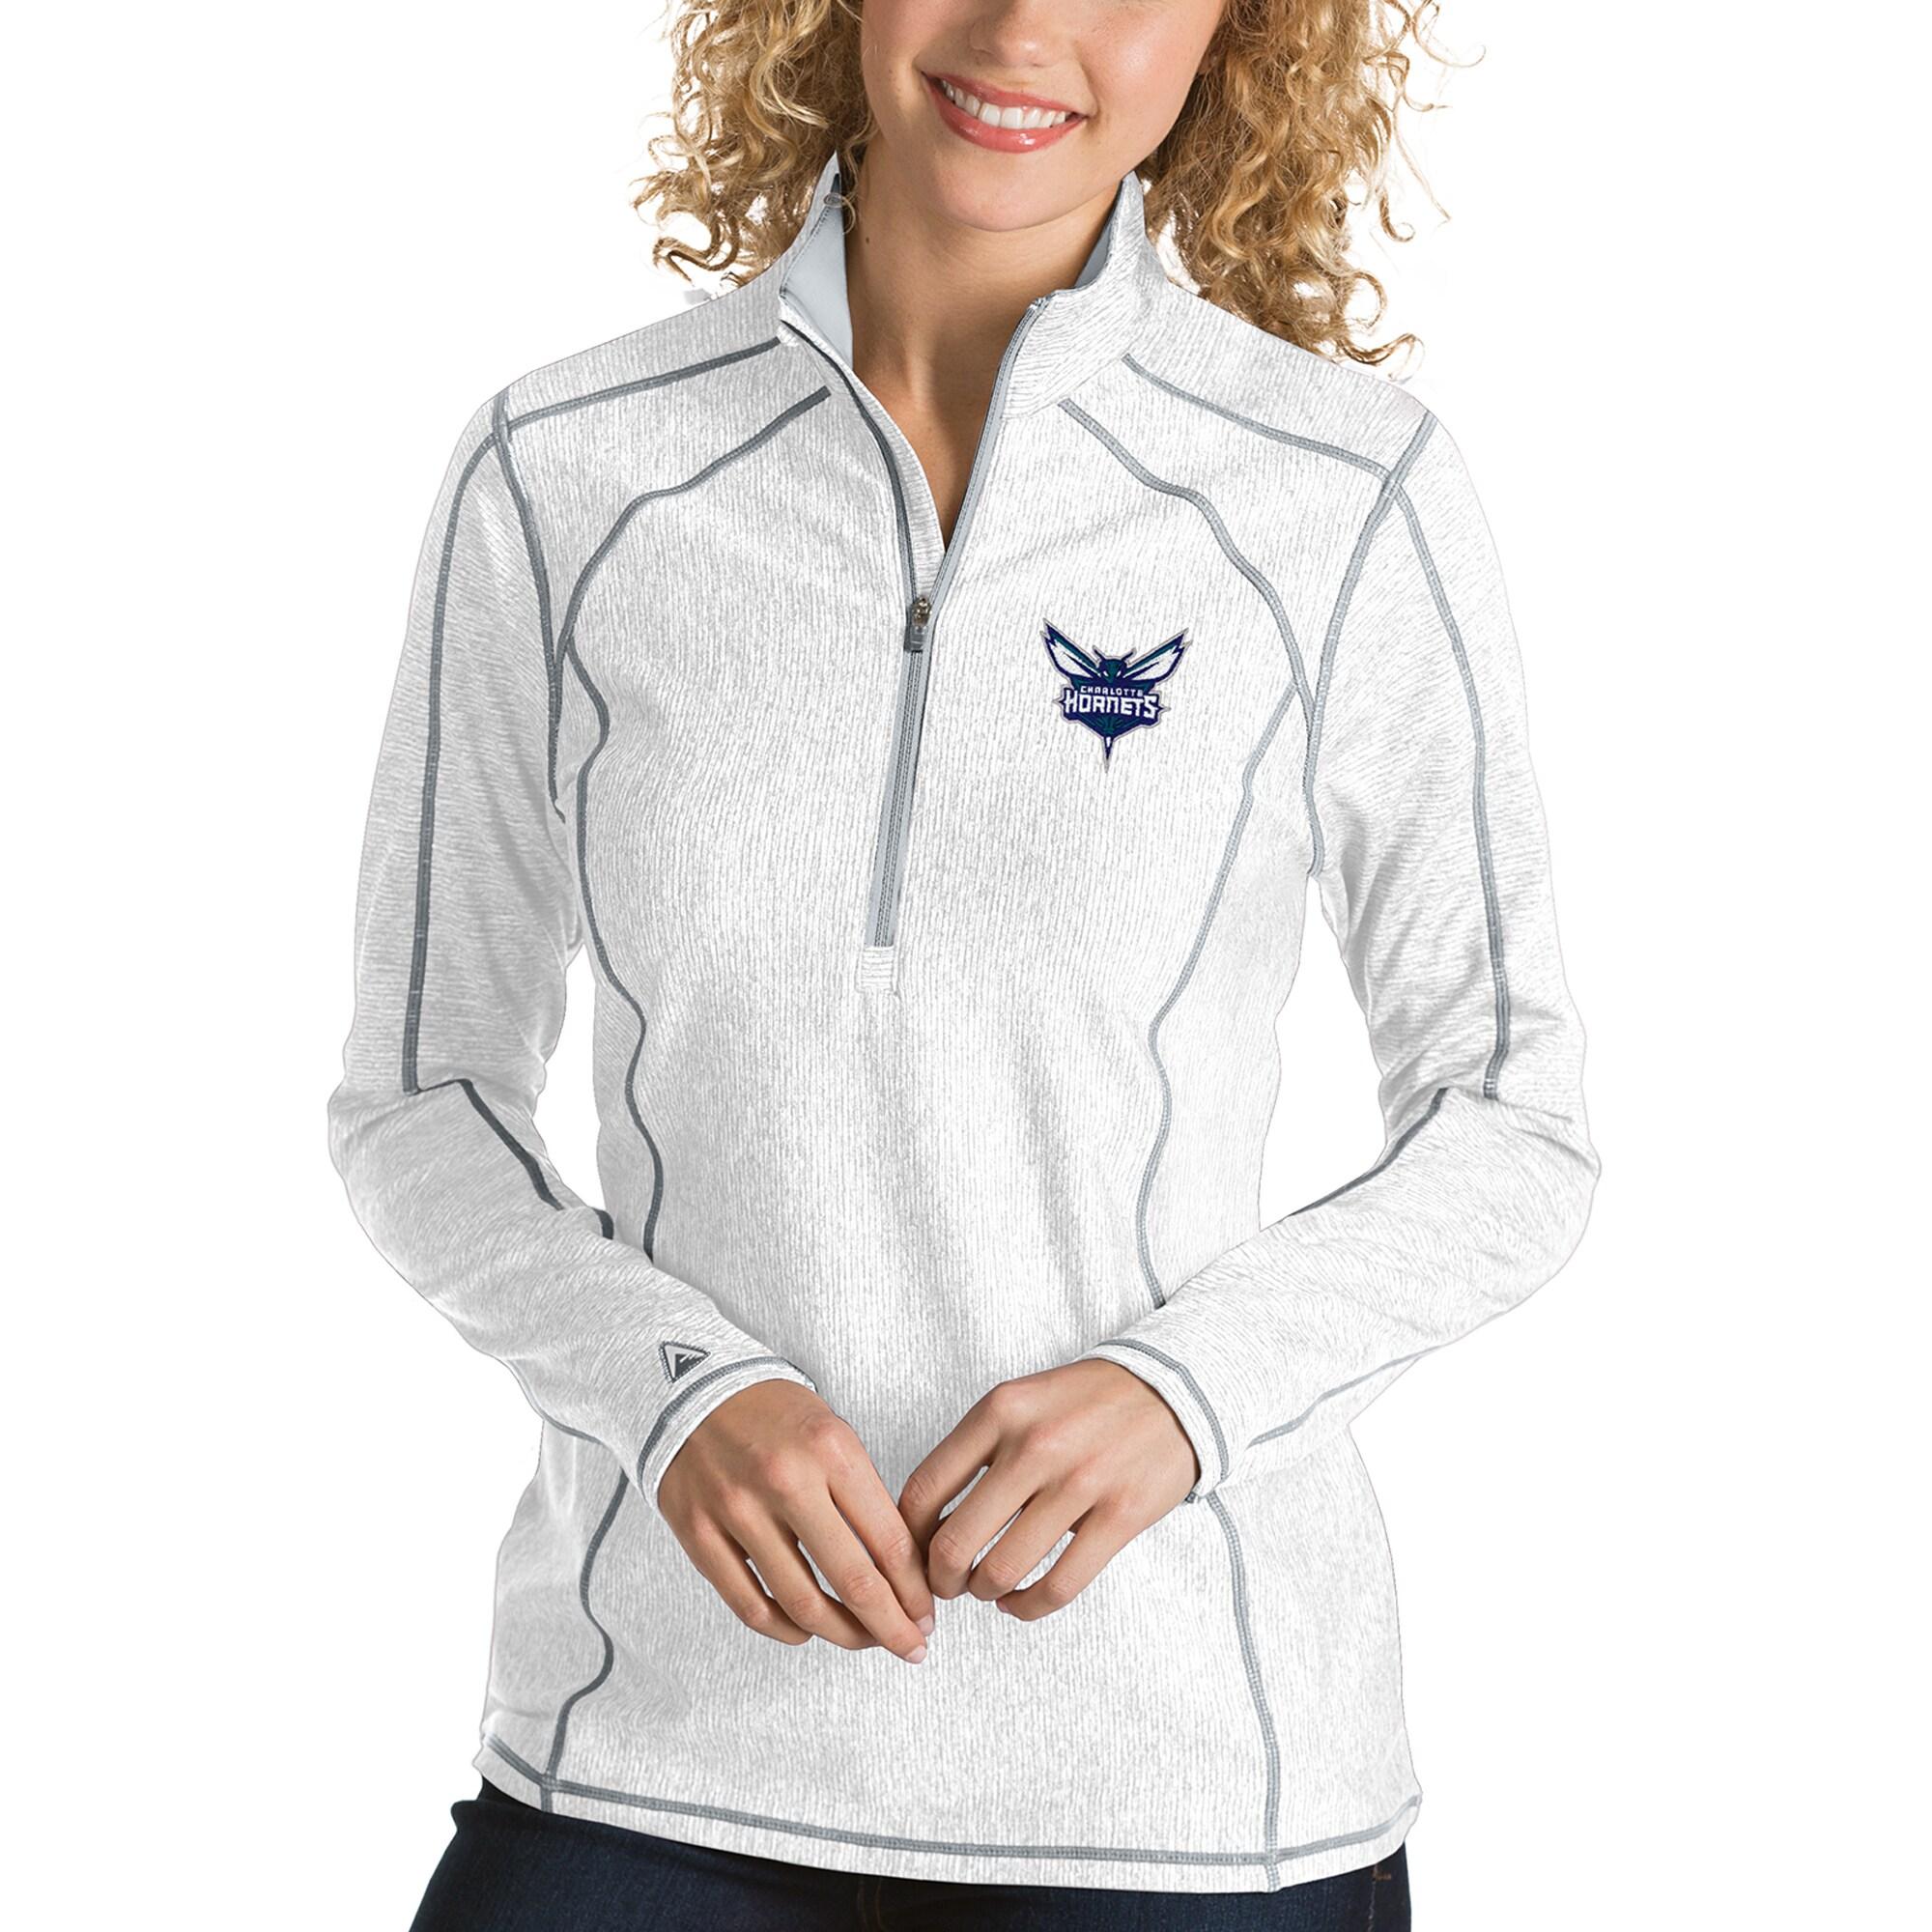 Charlotte Hornets Antigua Women's Tempo Half-Zip Pullover Jacket - White